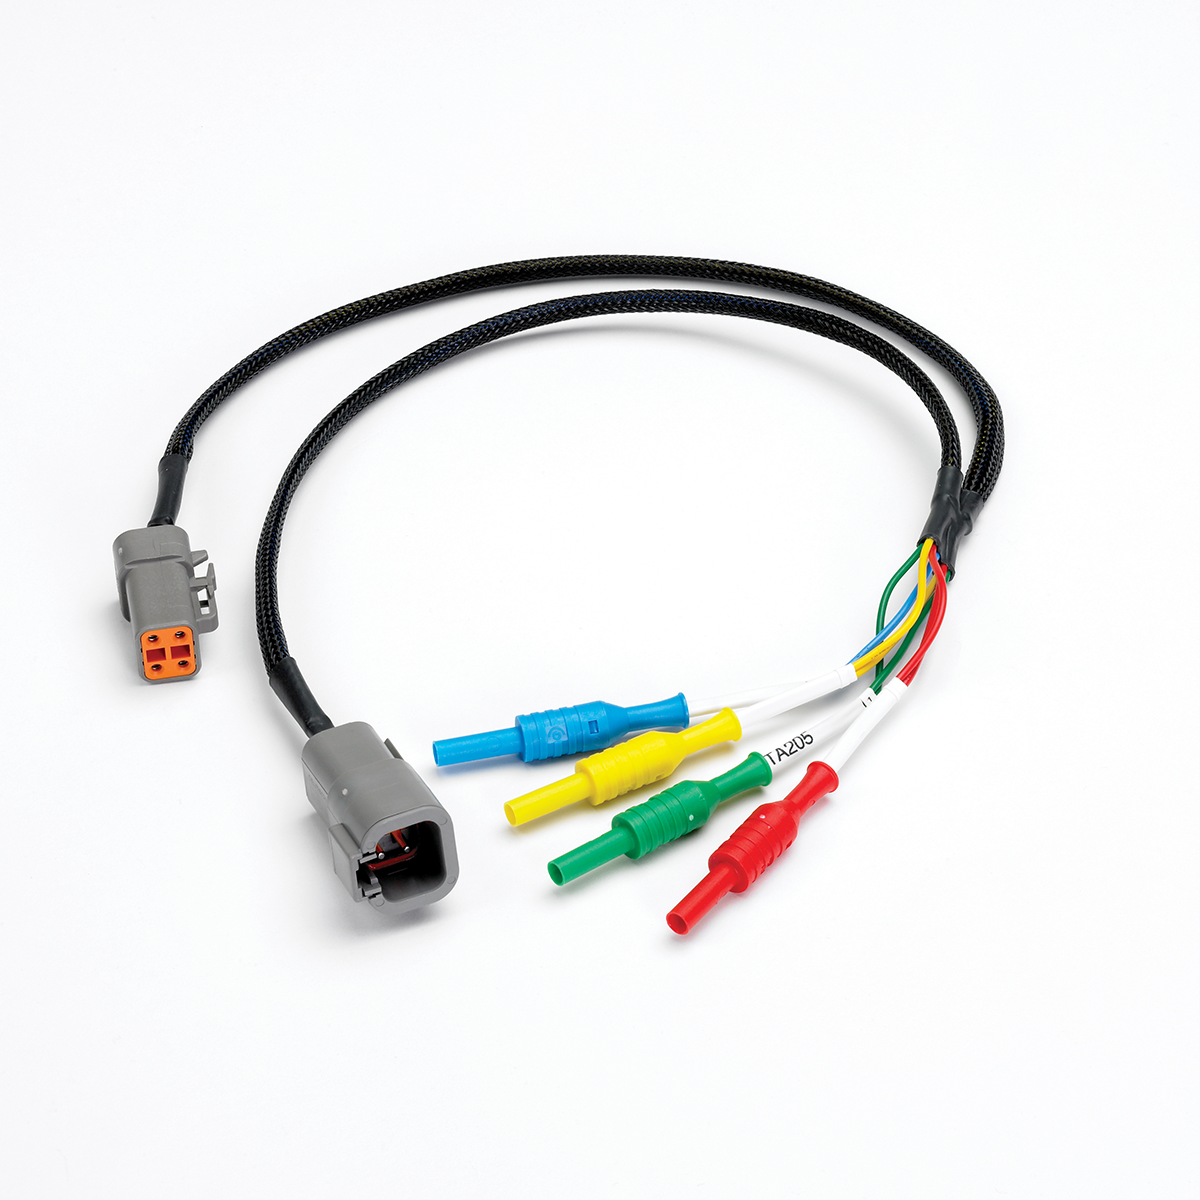 4-pin large Deutsch DTPXX-4 connector breakout lead